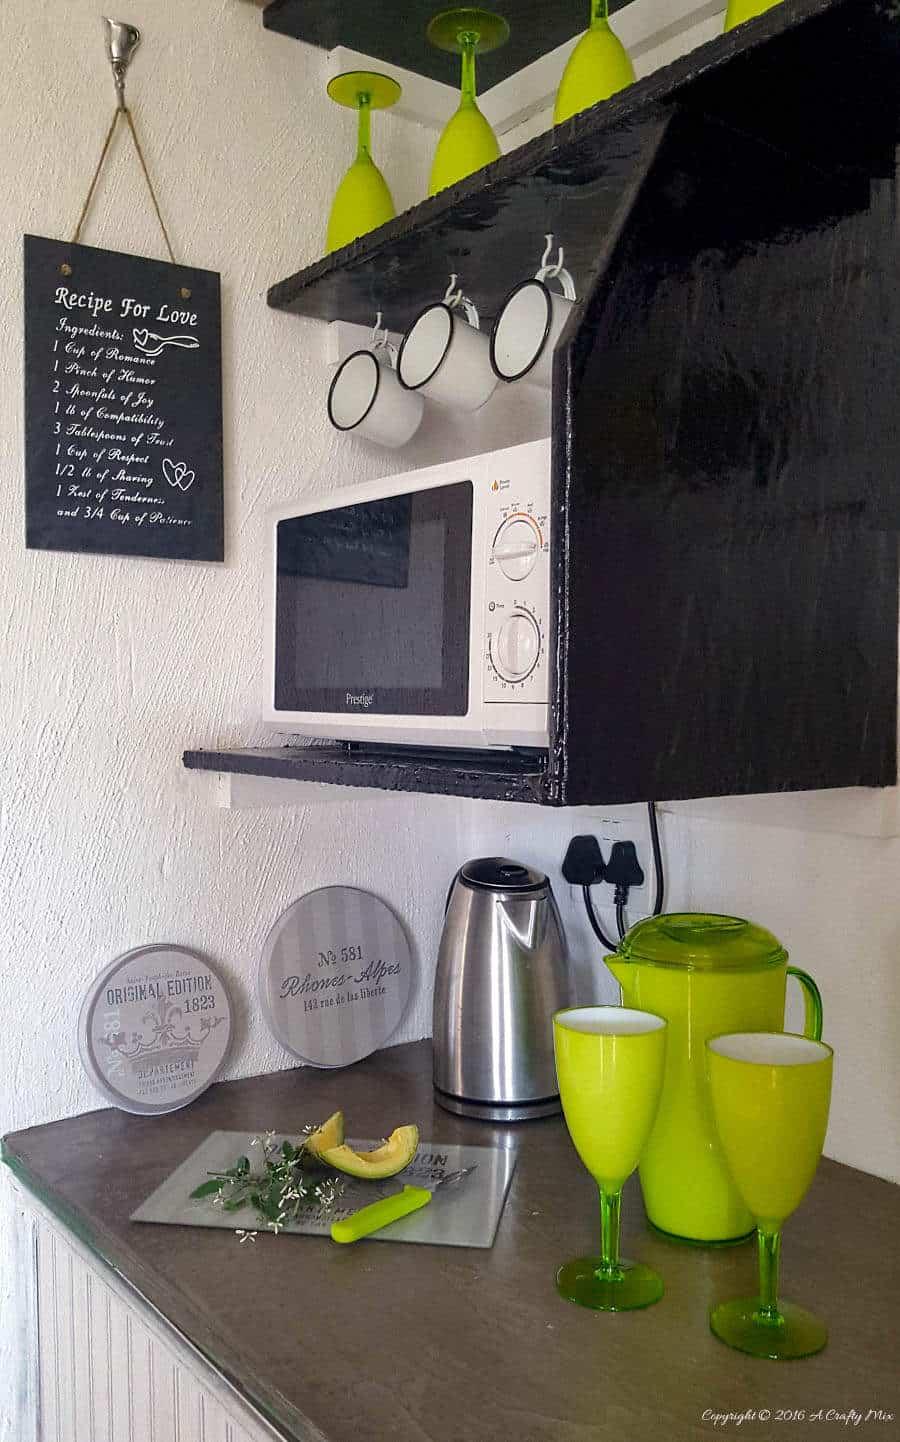 Lime green plastic jug and wine glasses